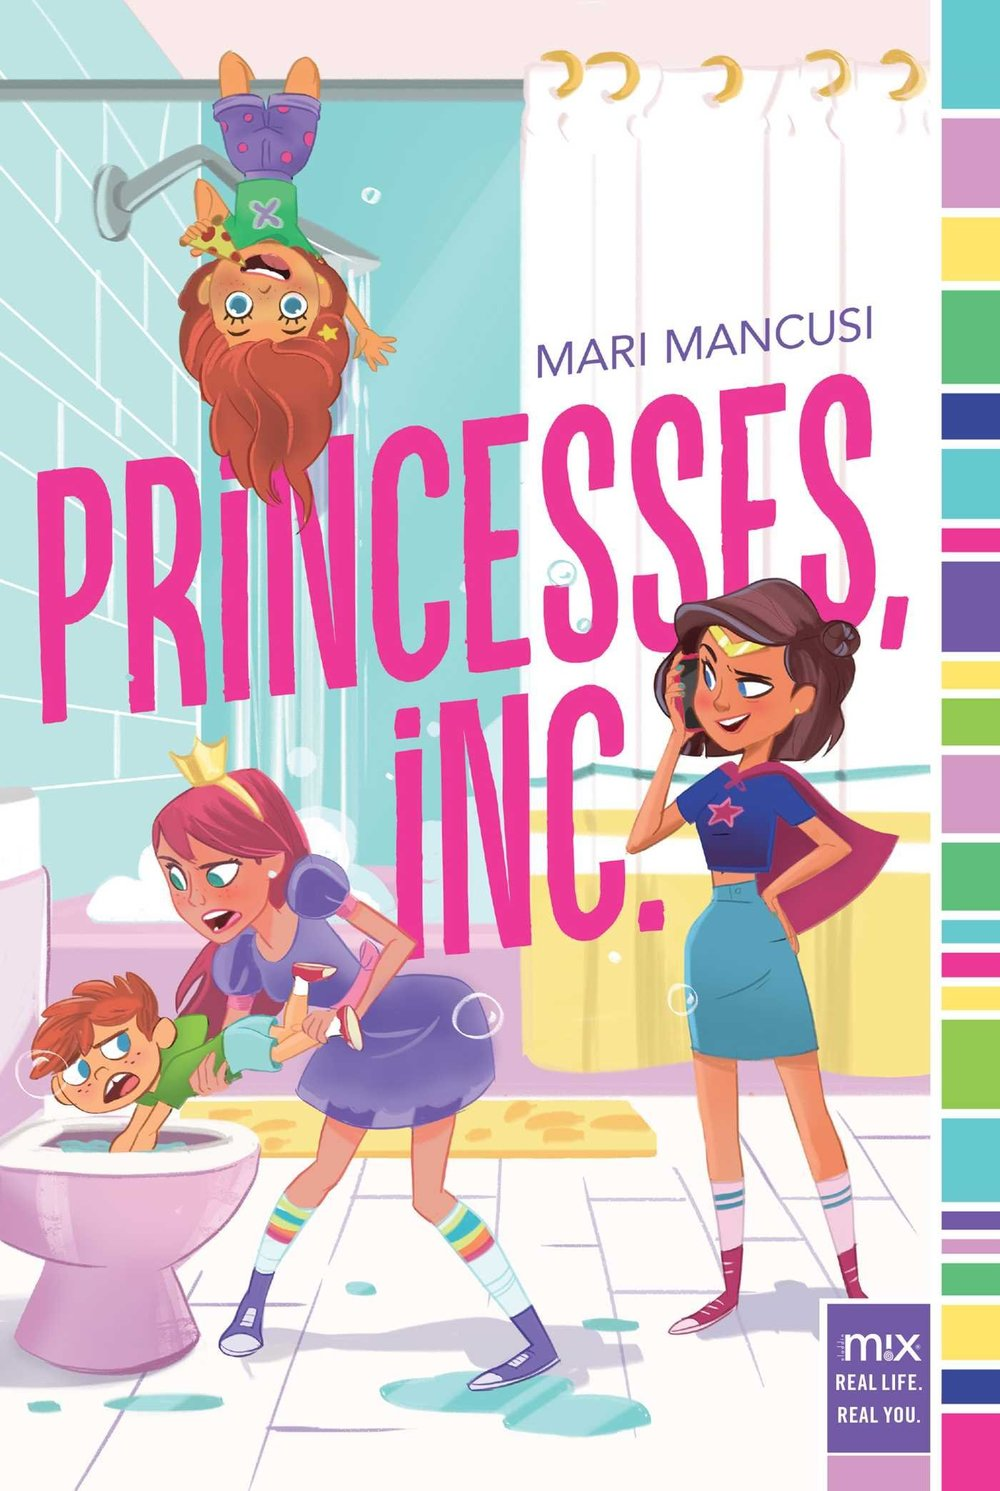 mancusi-princess-inc.jpg